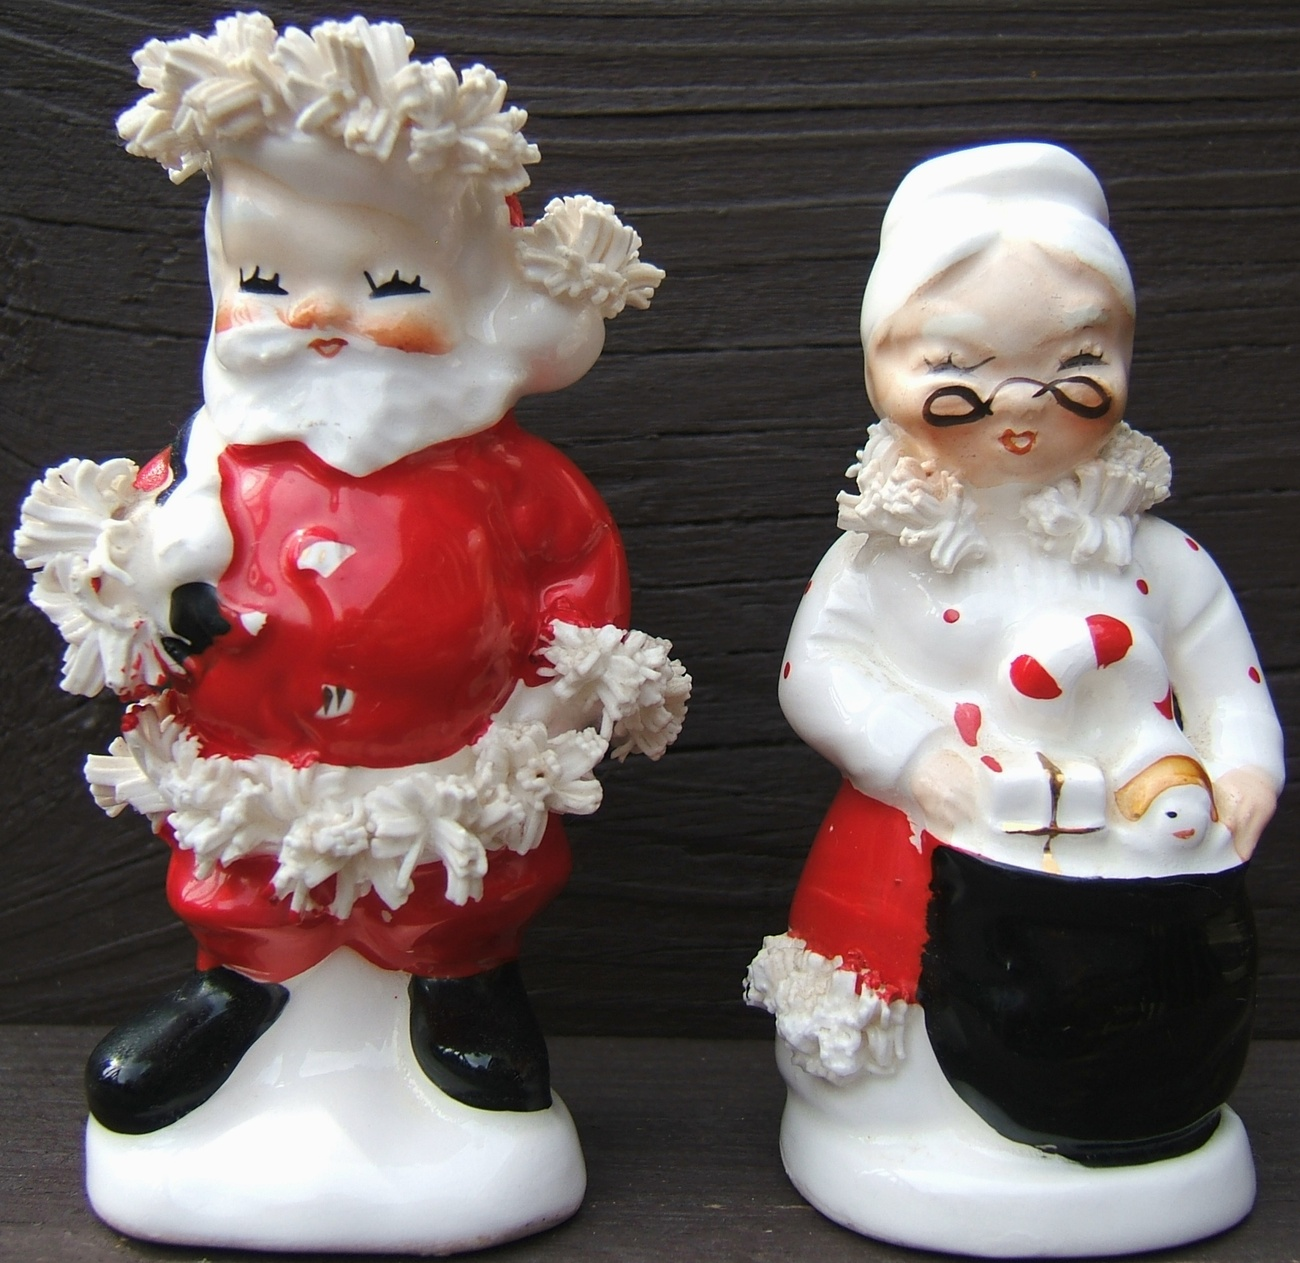 Vintage NAPCO SANTA and MRS CLAUS CHRISTMAS Ceramic Salt Pepper Shaker Set 1950s - $124.99